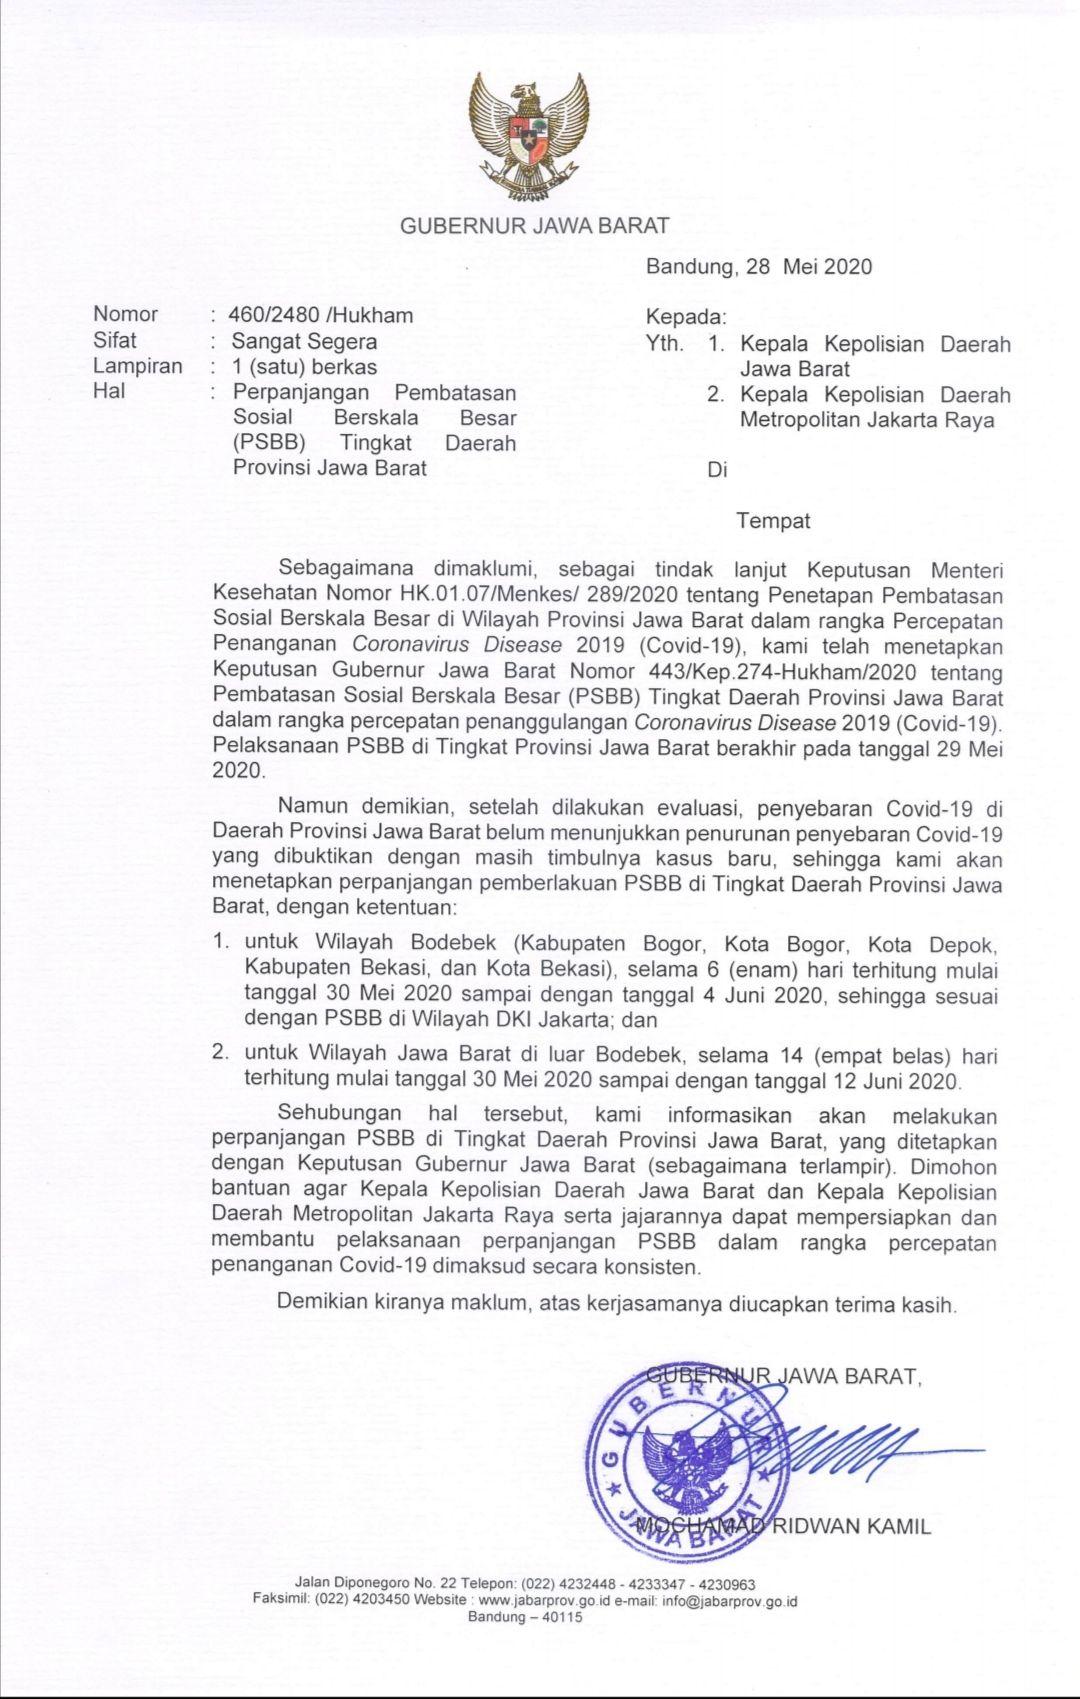 Perpanjangan PSBB Jawa Barat ditetapkan dalam Keputusan Gubenur.